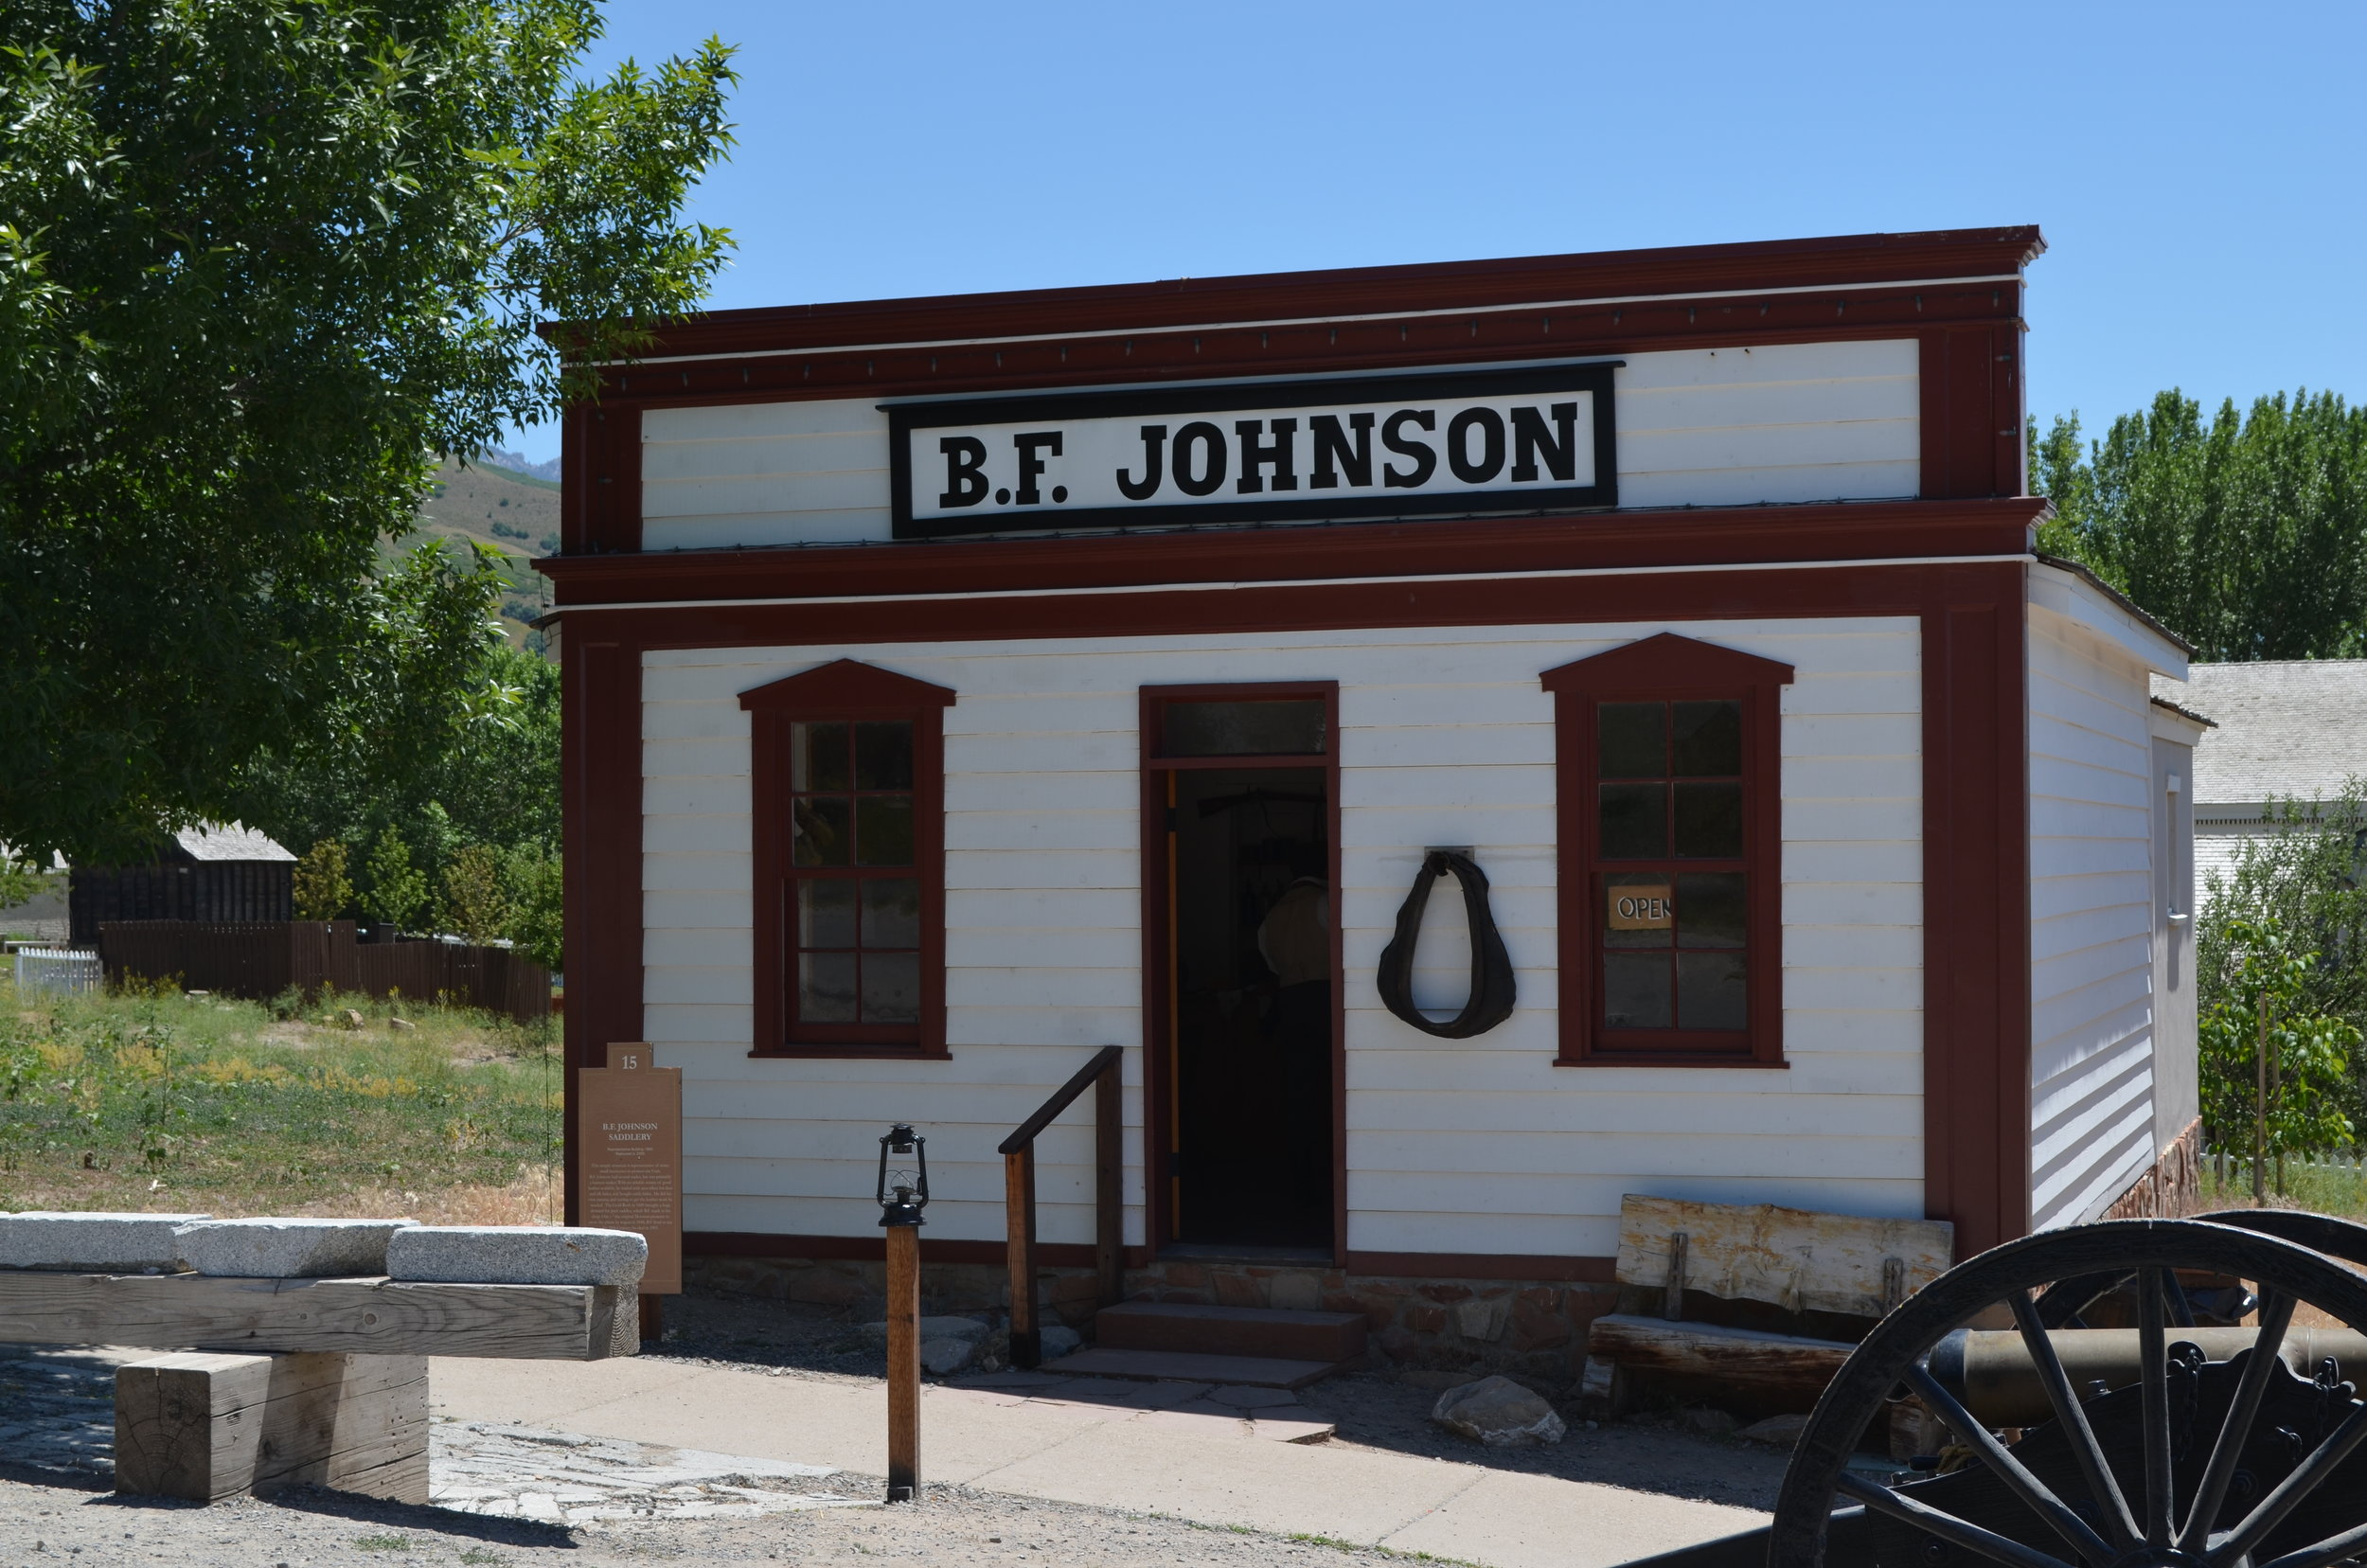 B.F. Johnson Saddlery